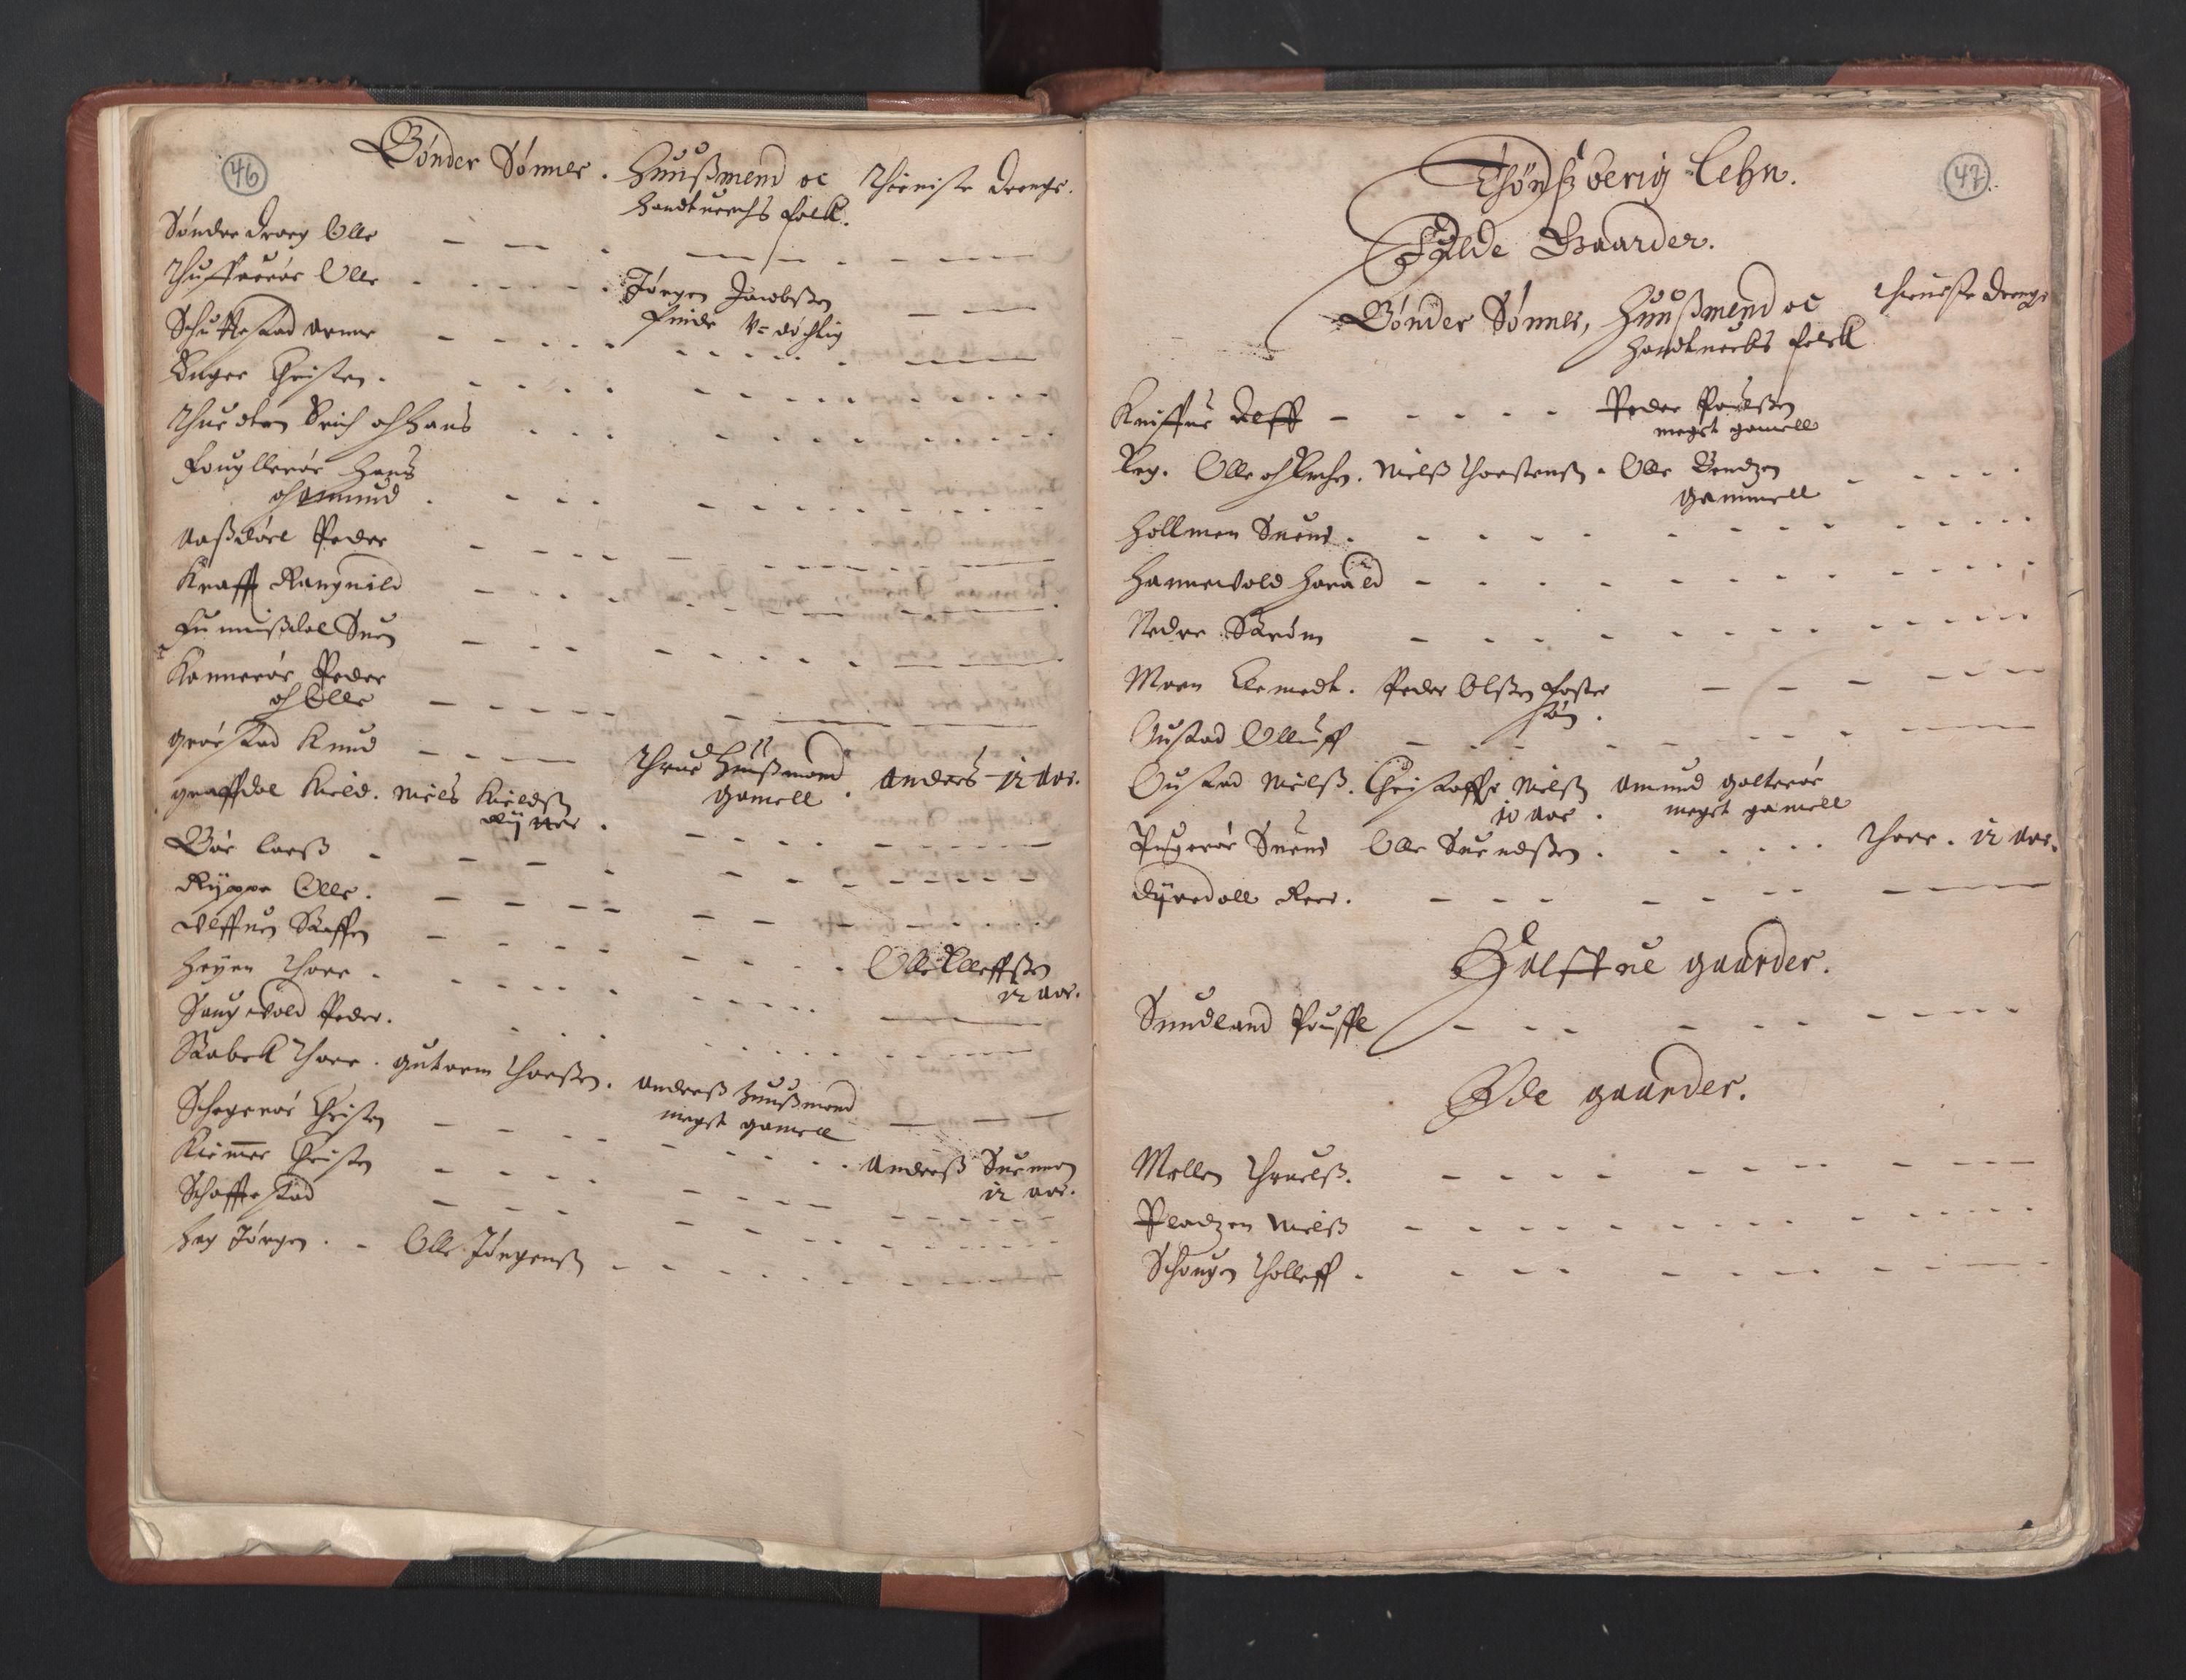 RA, Fogdenes og sorenskrivernes manntall 1664-1666, nr. 5: Fogderier (len og skipreider) i nåværende Buskerud fylke og Vestfold fylke, 1664, s. 46-47